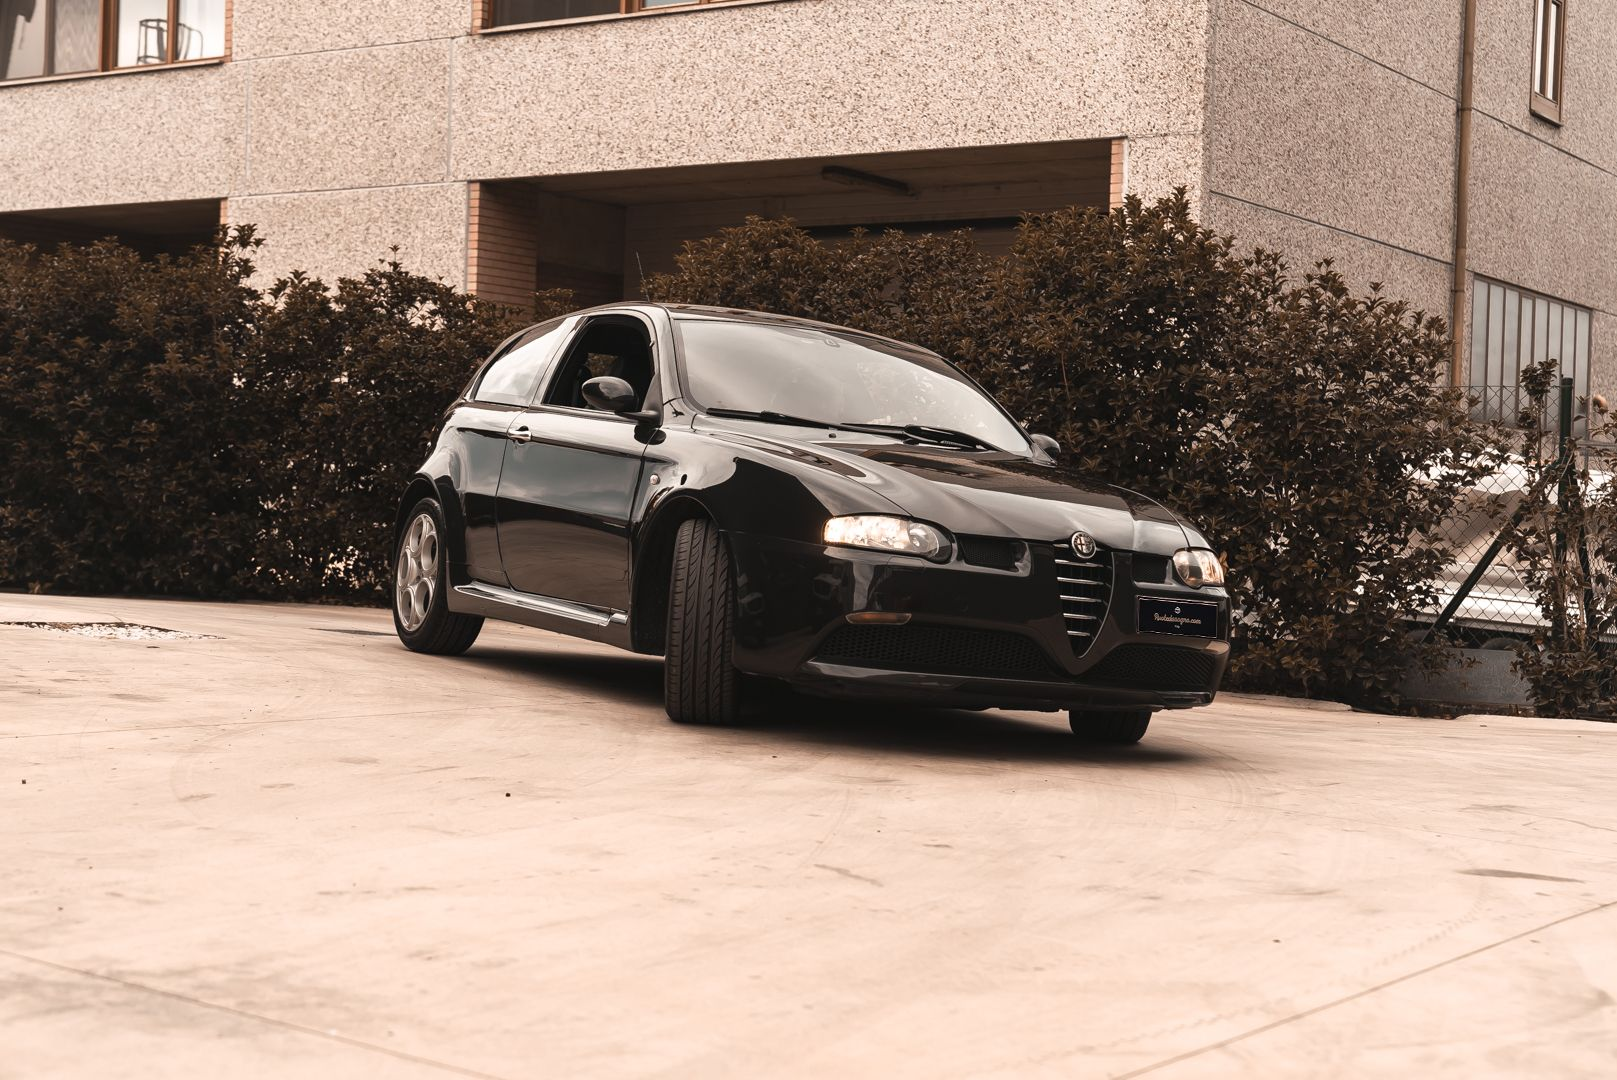 2003 Alfa Romeo 147 GTA 3.2i V6 24V 79572